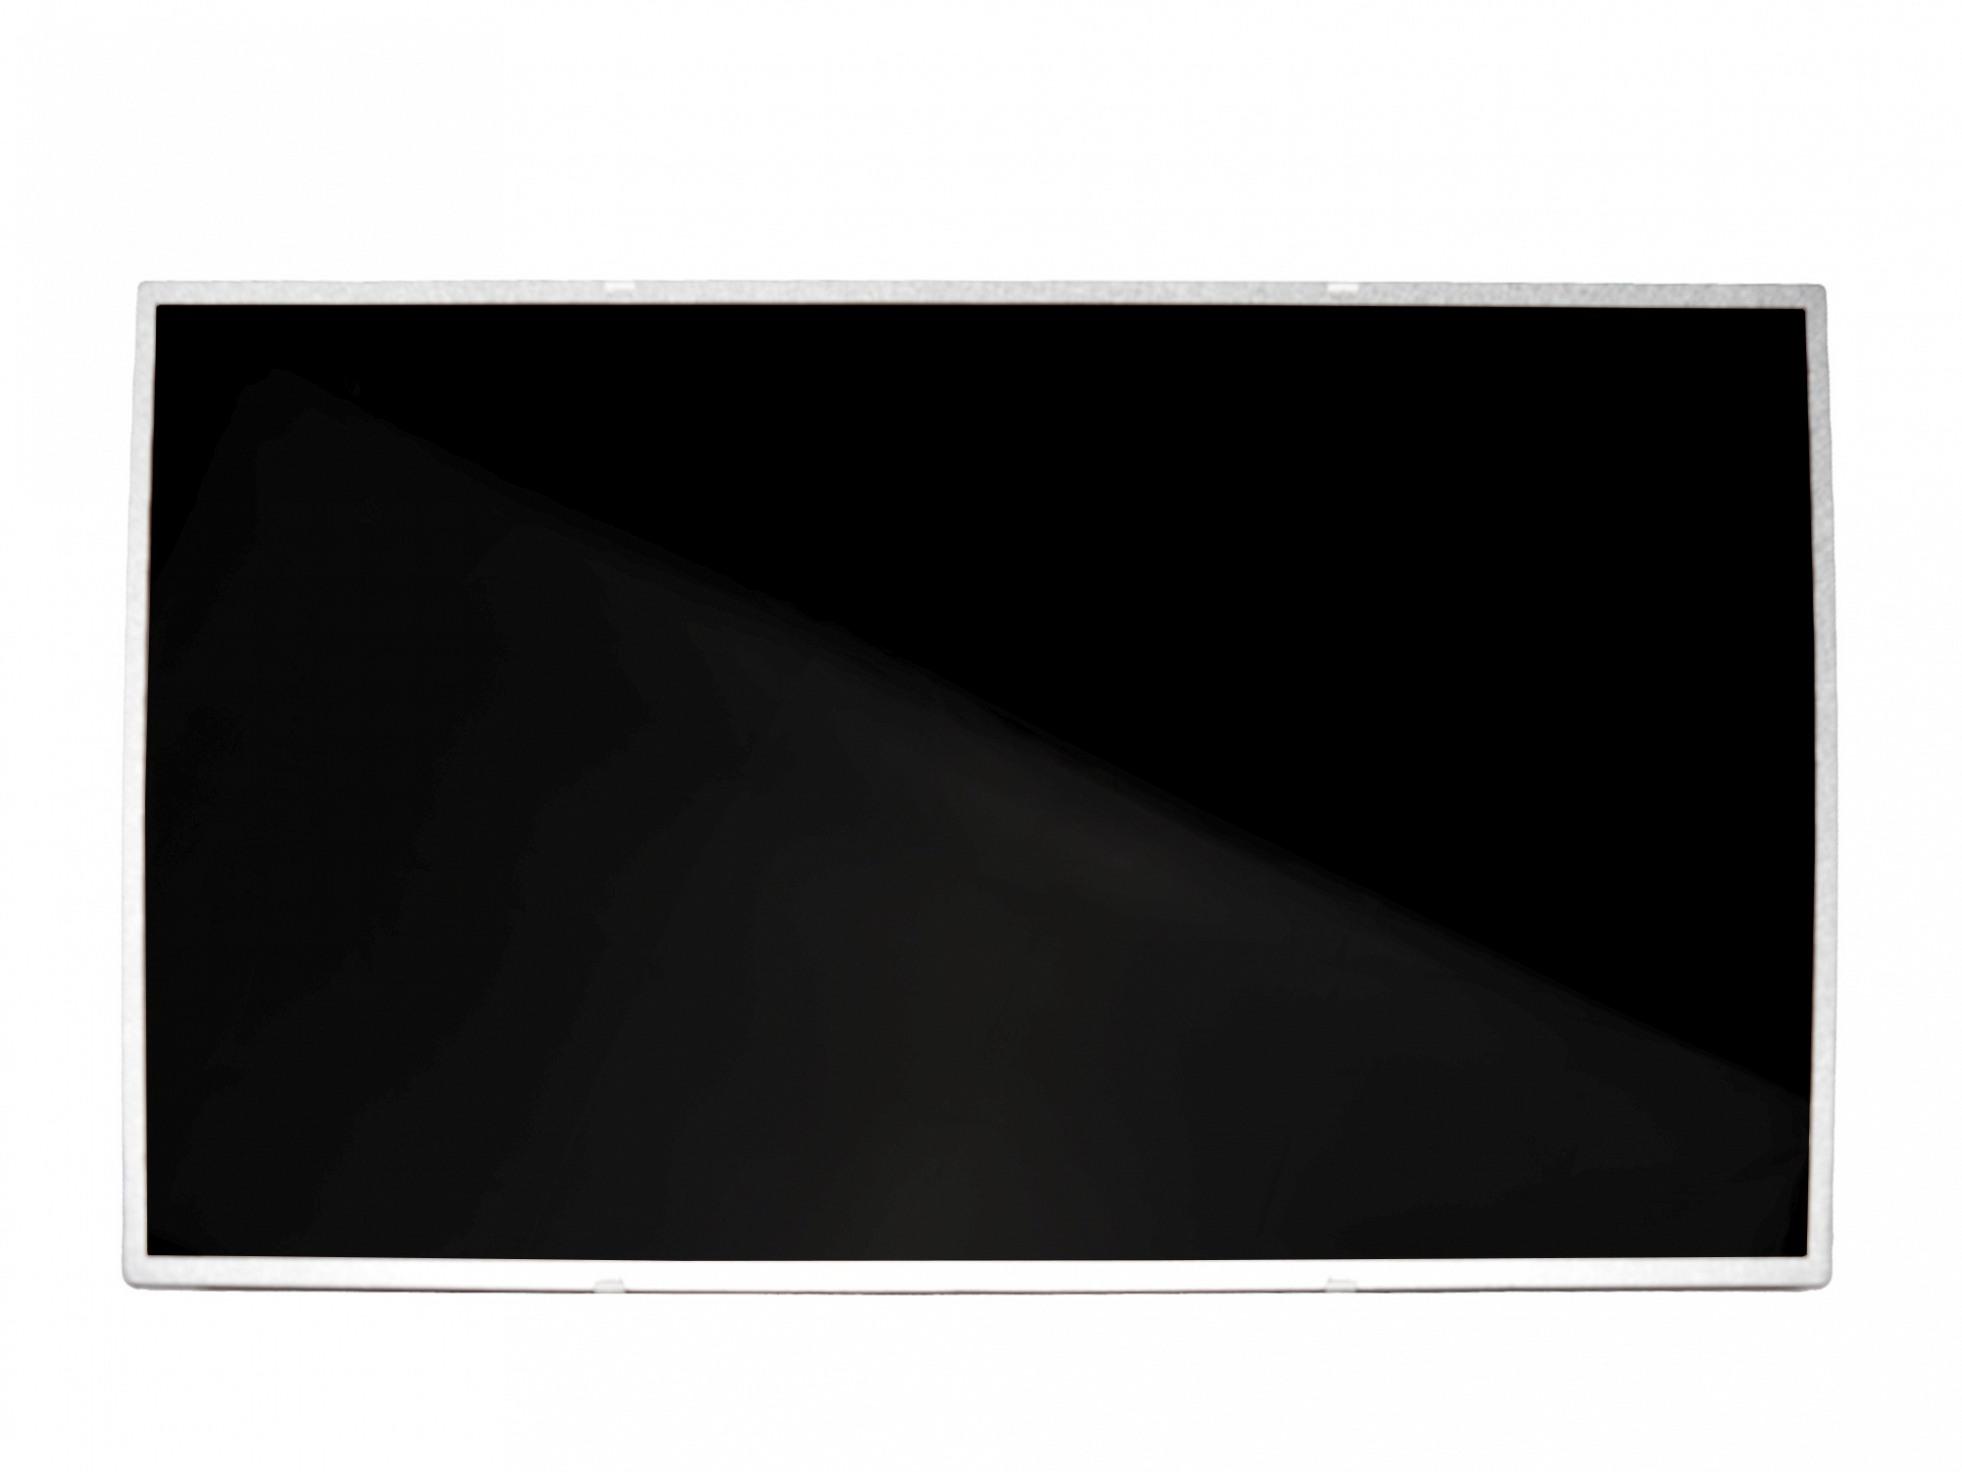 Display 15,6 Zoll HD glare LED inkl. Einbau für Wortmann Terra Mobile 1509